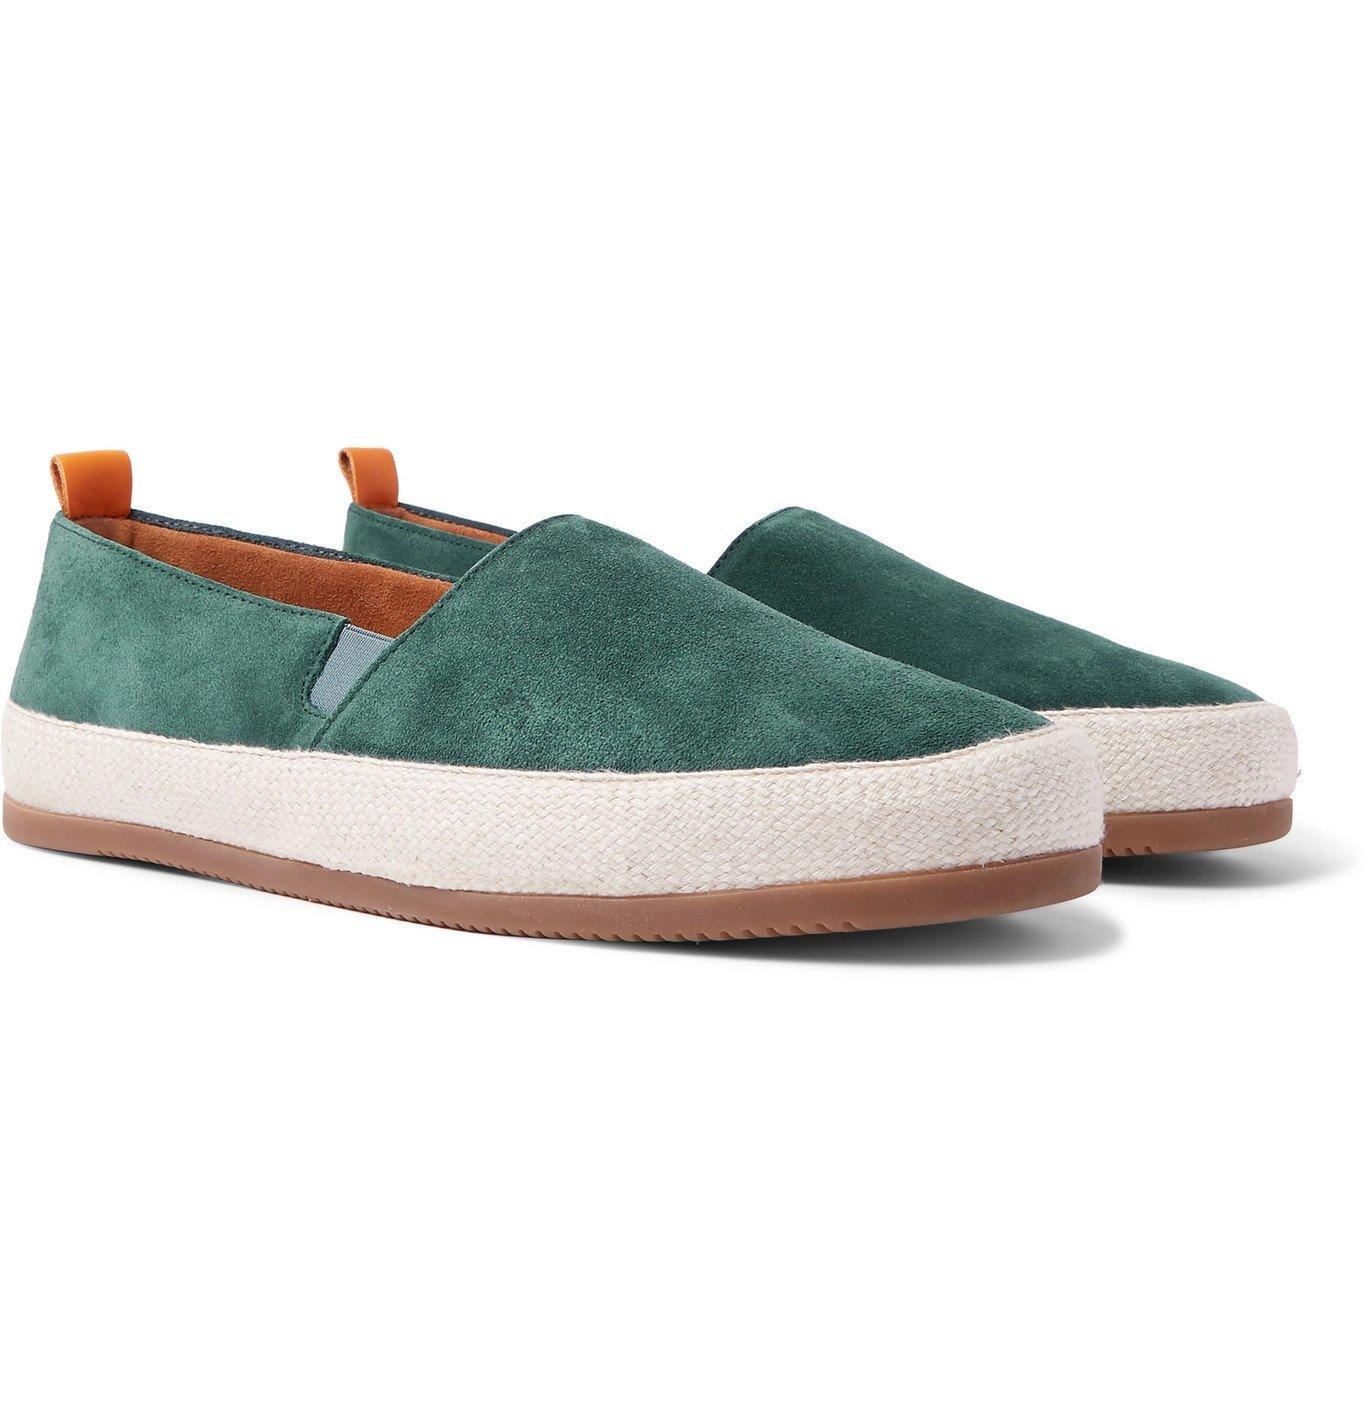 Photo: Mulo - Suede Slip-On Sneakers - Blue